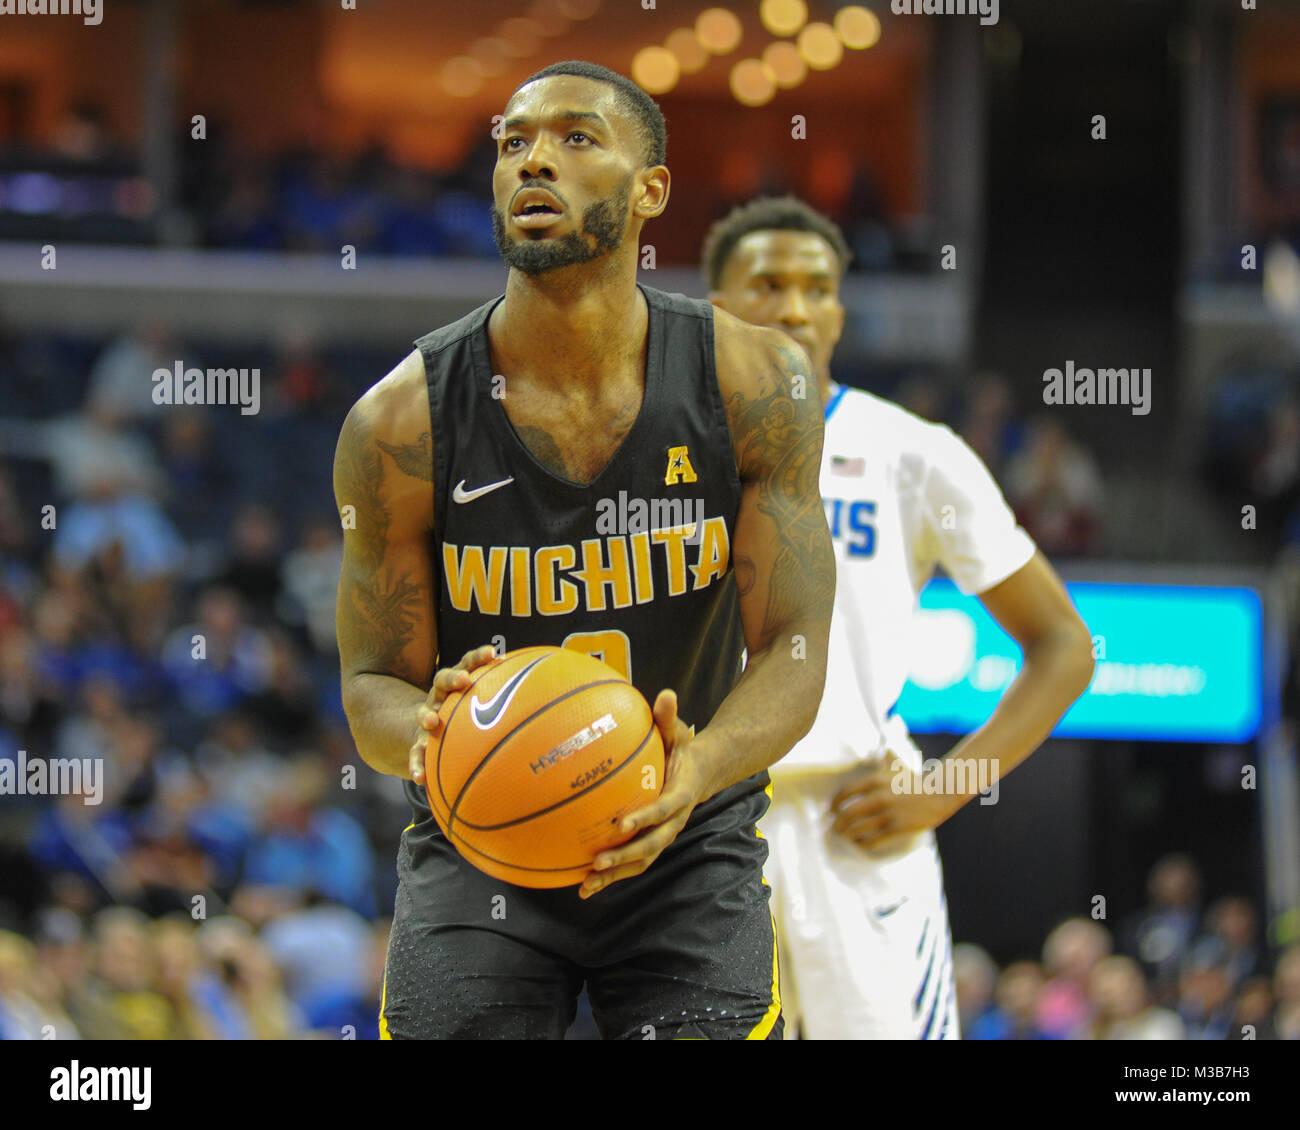 C.J. Keyser Wichita State Shockers Basketball Jersey-White